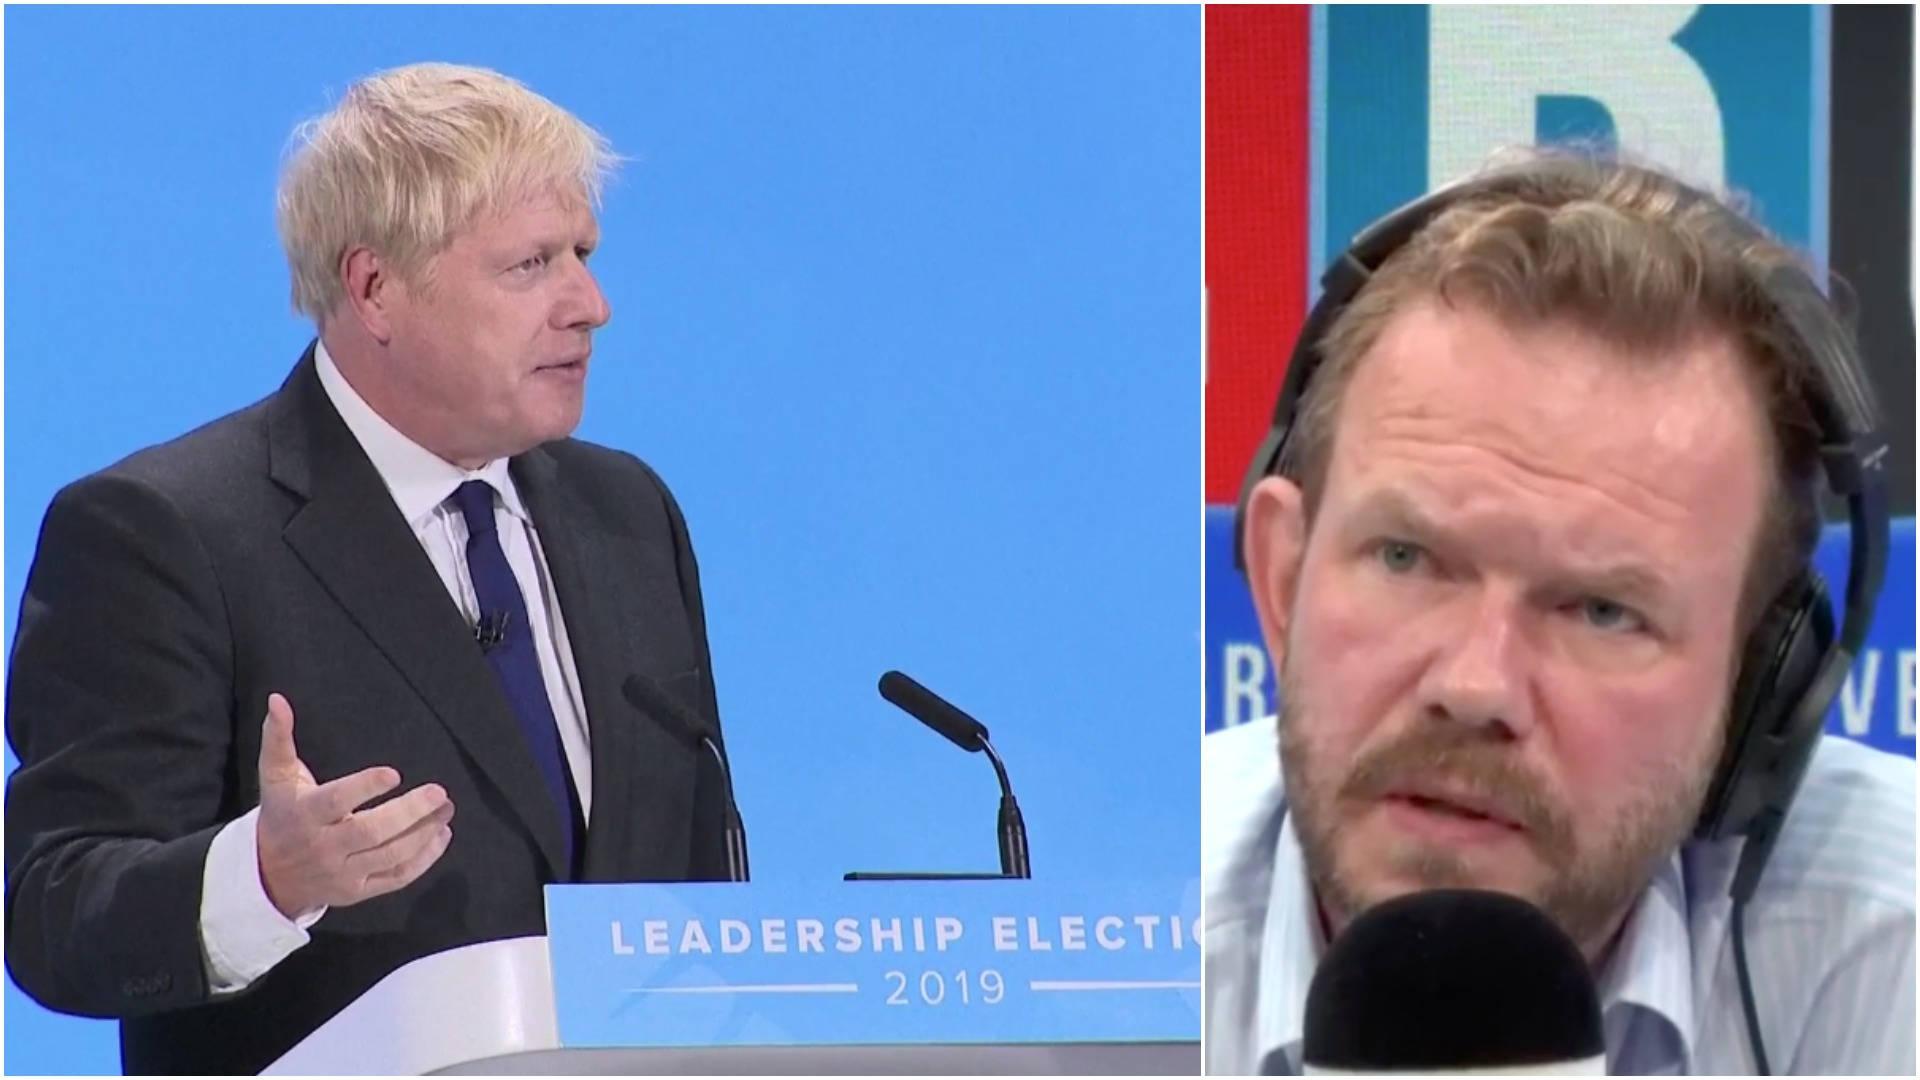 James O'Brien's Stark Warning About Boris Johnson's Motivations